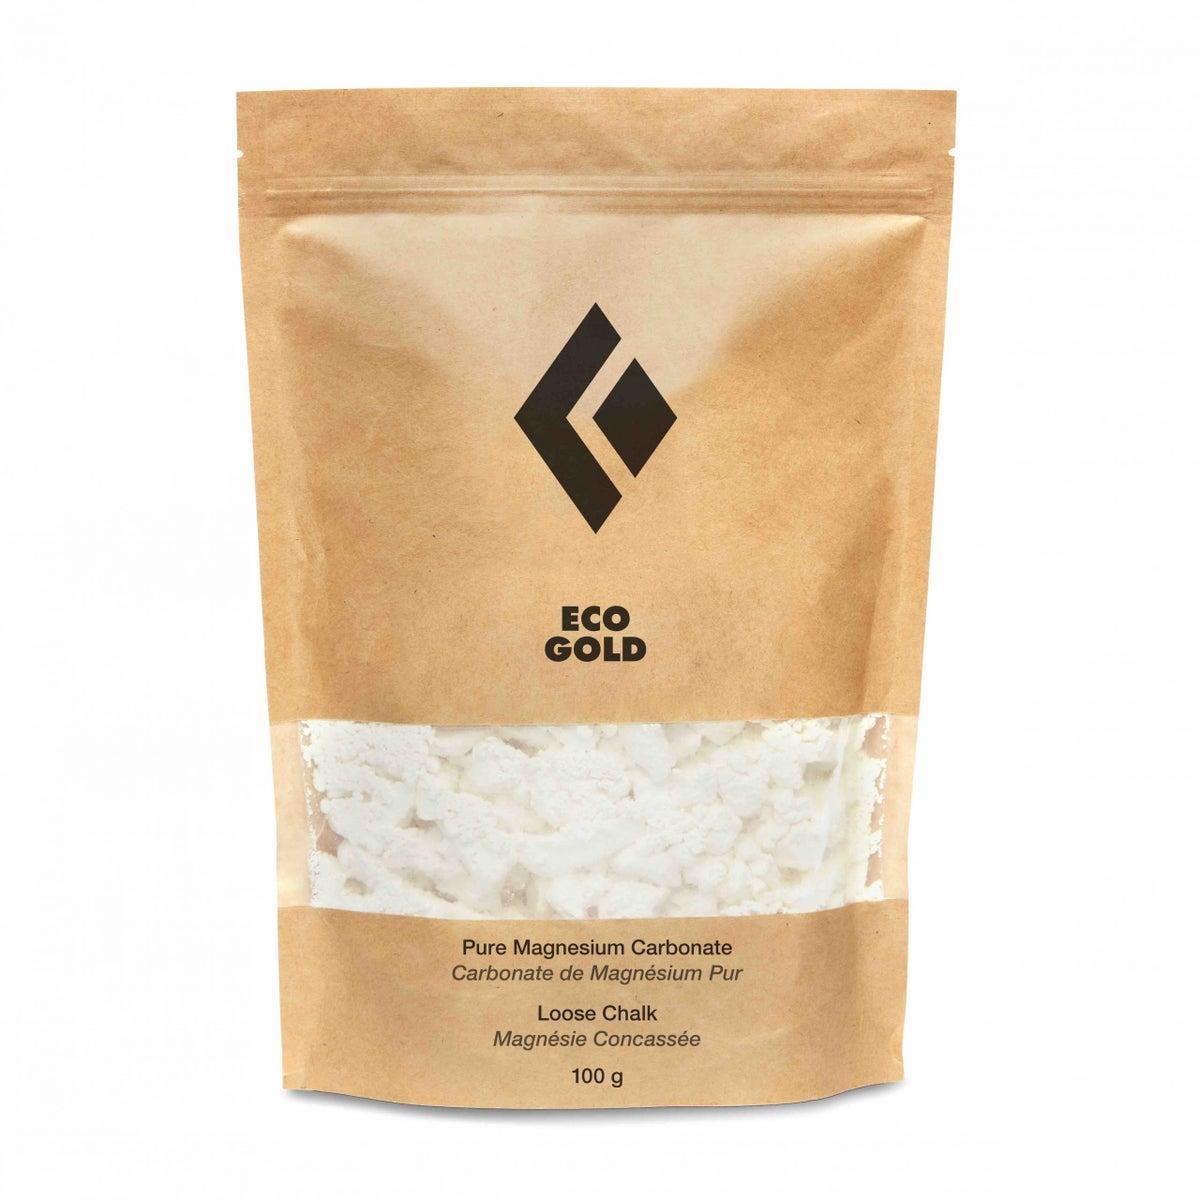 Green Buy: Black Diamond Eco Gold Loose Chalk